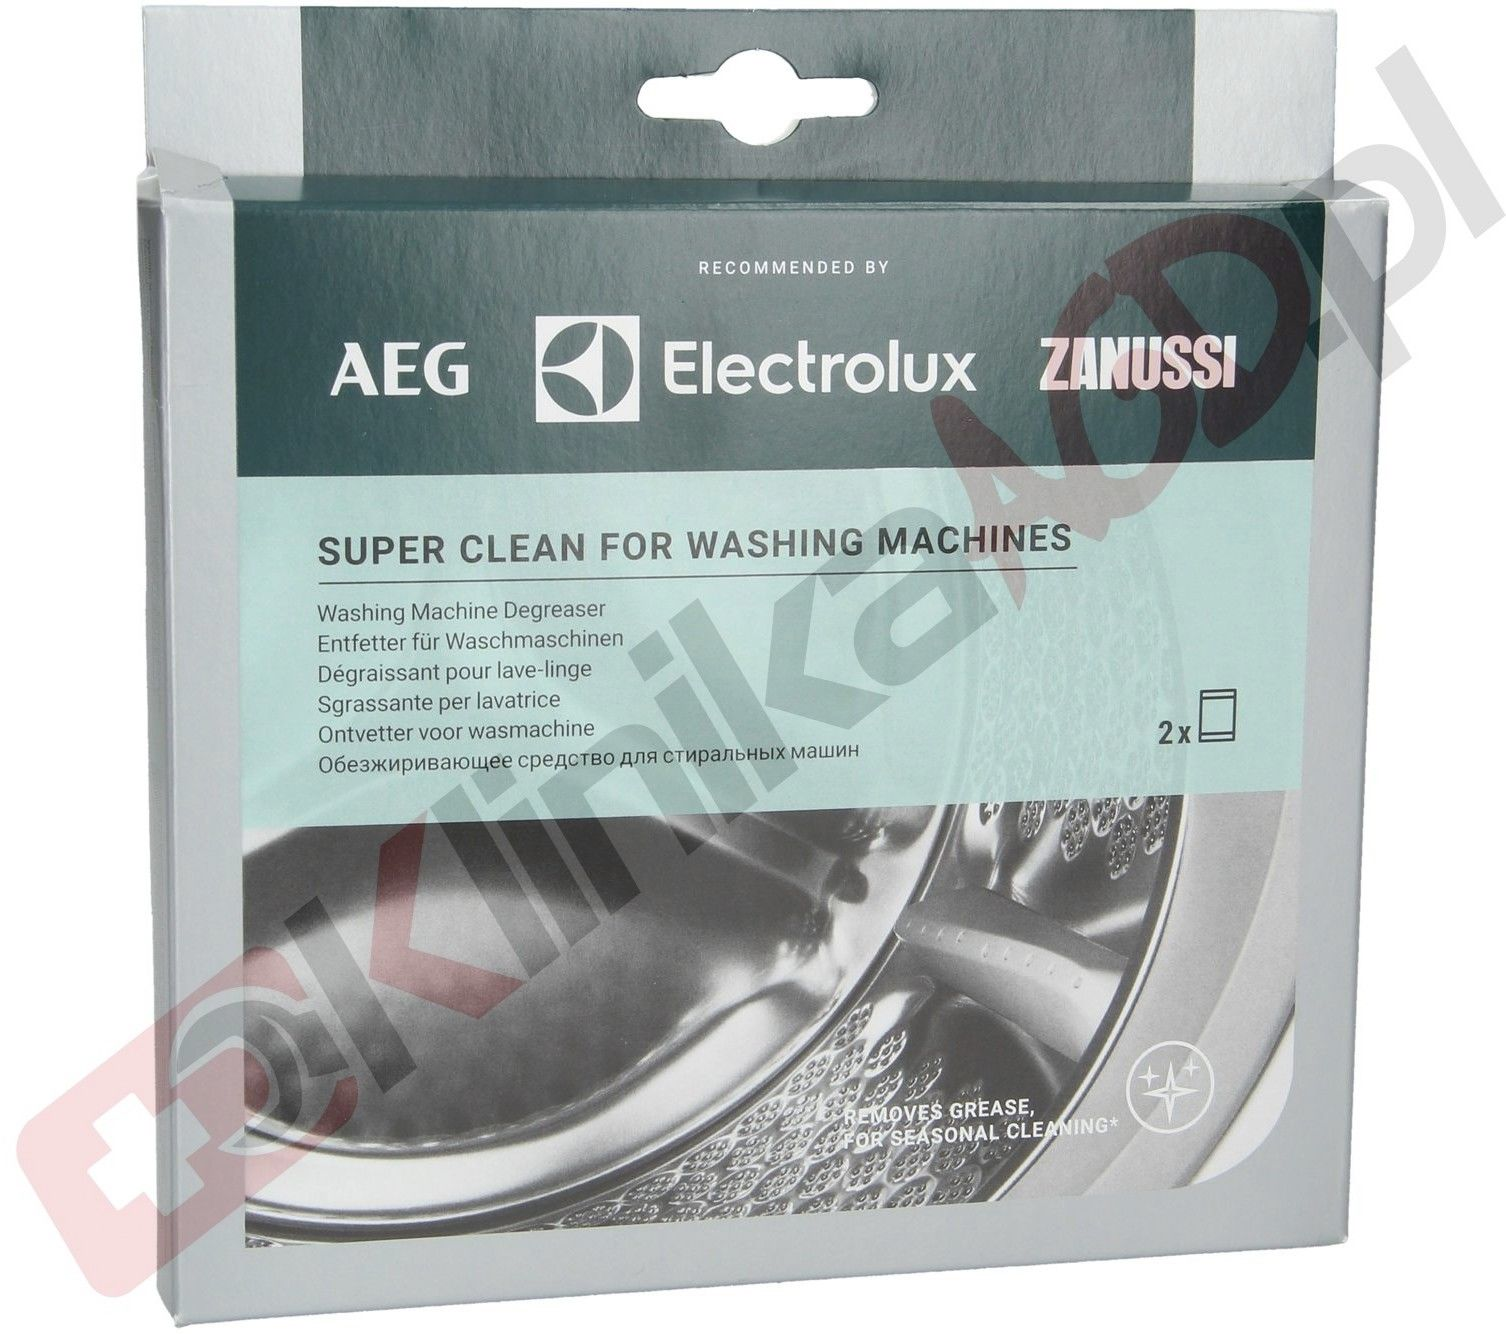 Środek czyszczący Electrolux super clean do pralki proszek 50g 2szt Zoppas